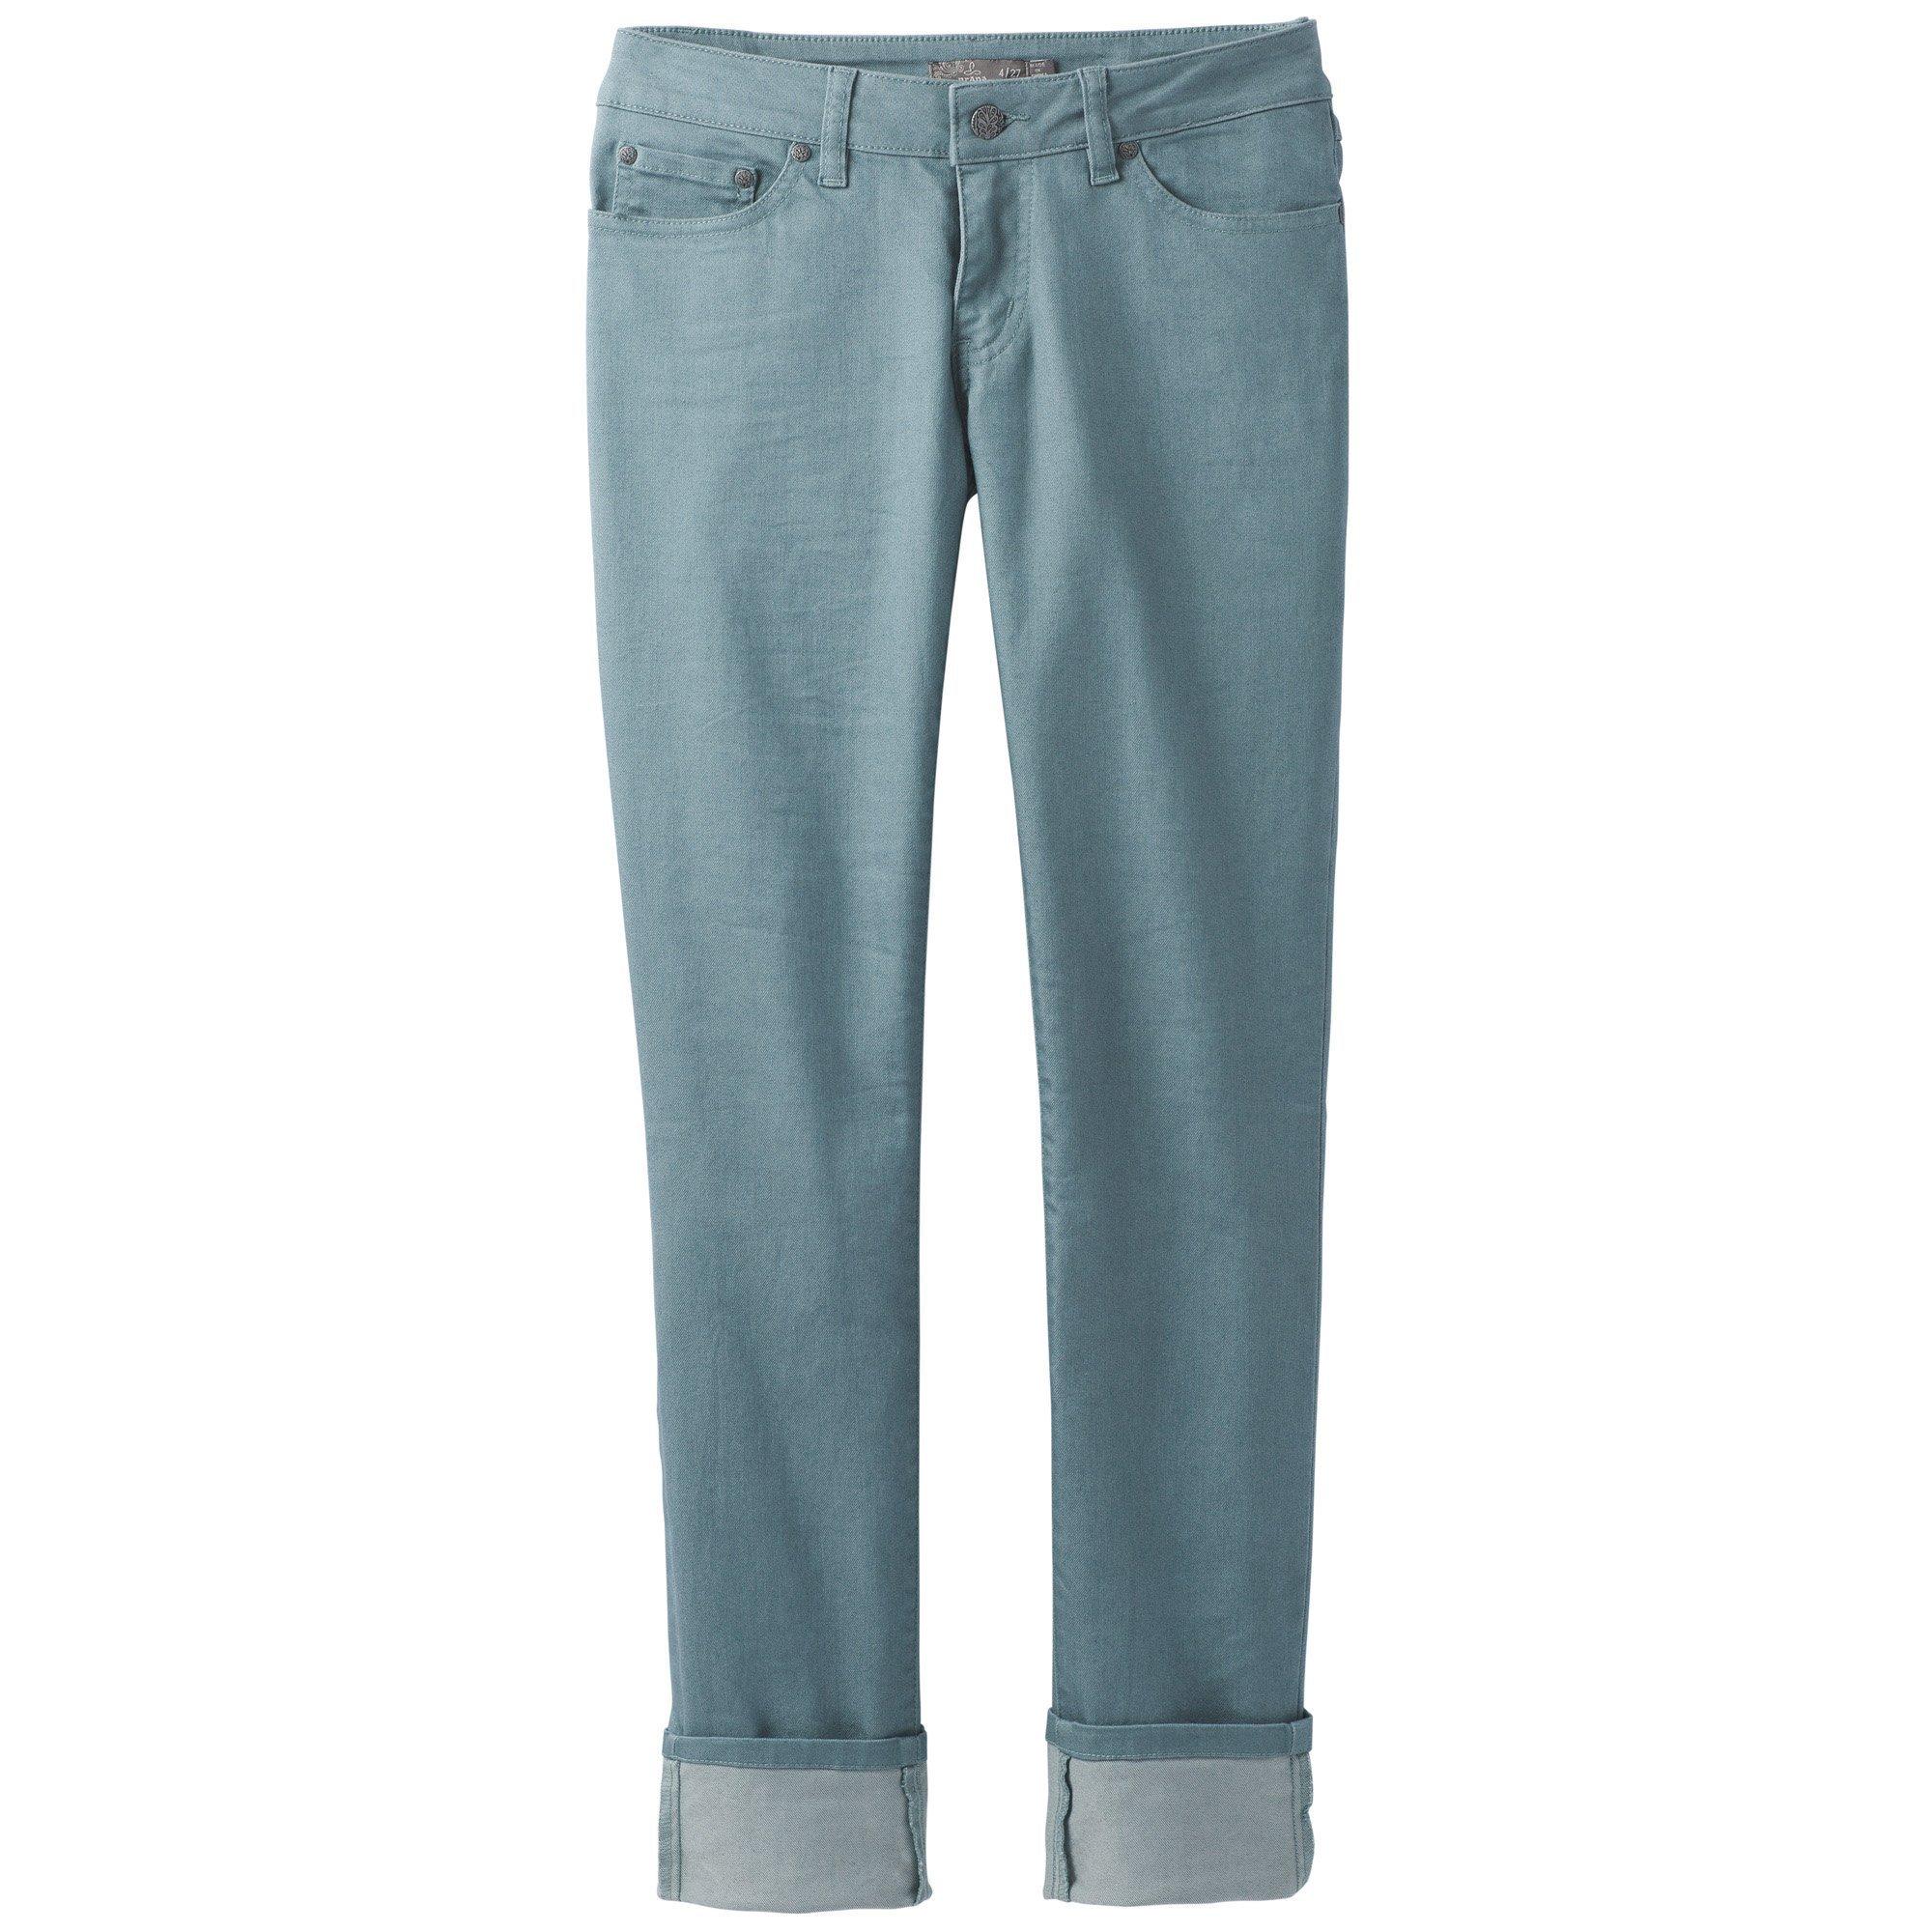 prAna Kara Jean Pants, Starling Green, Size 16